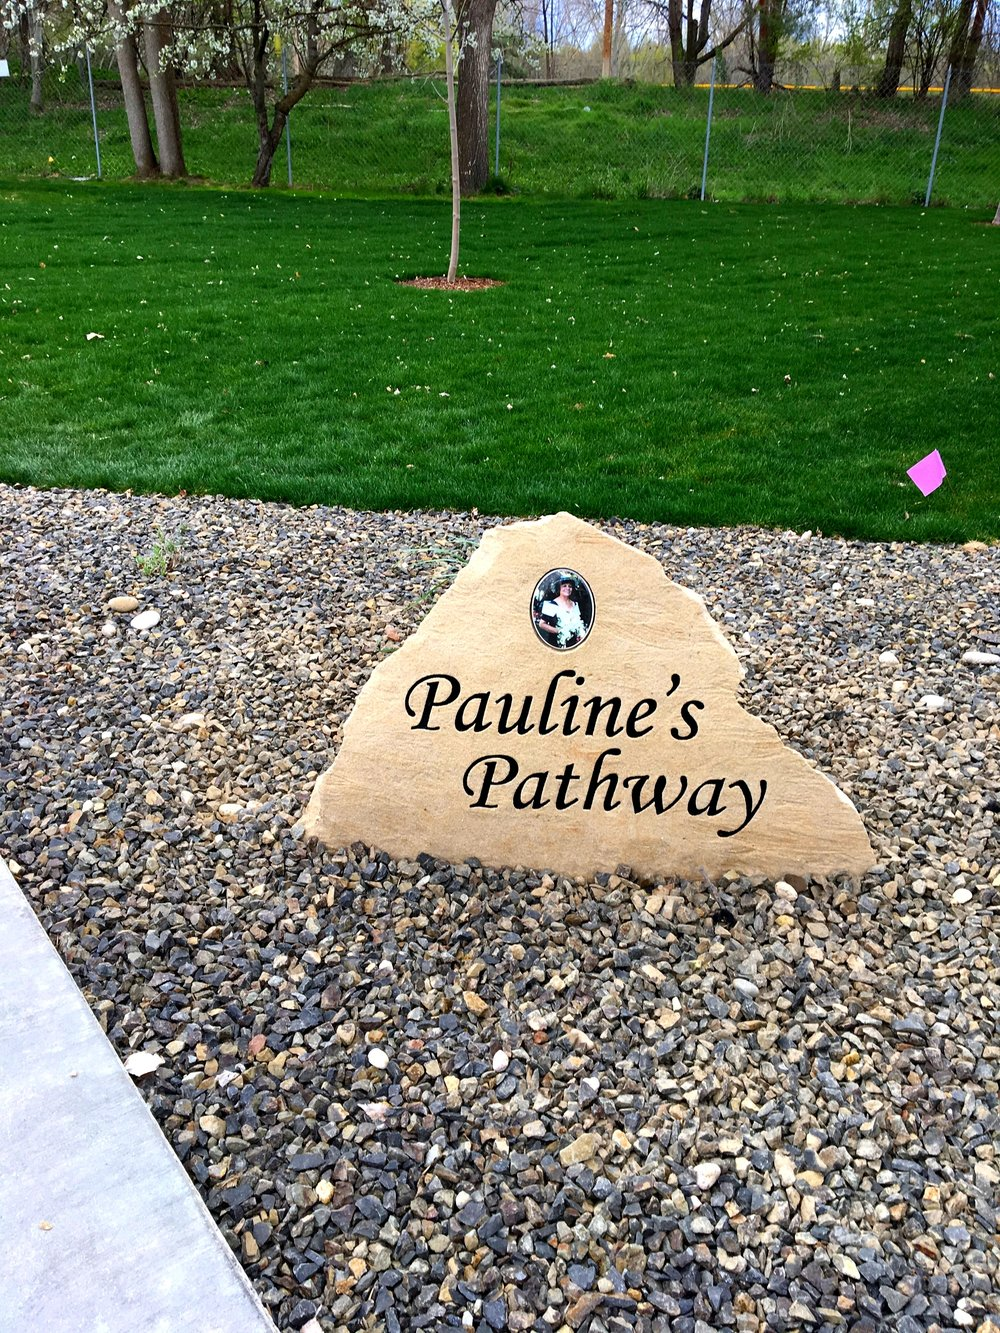 Pauline's Pathway.JPG